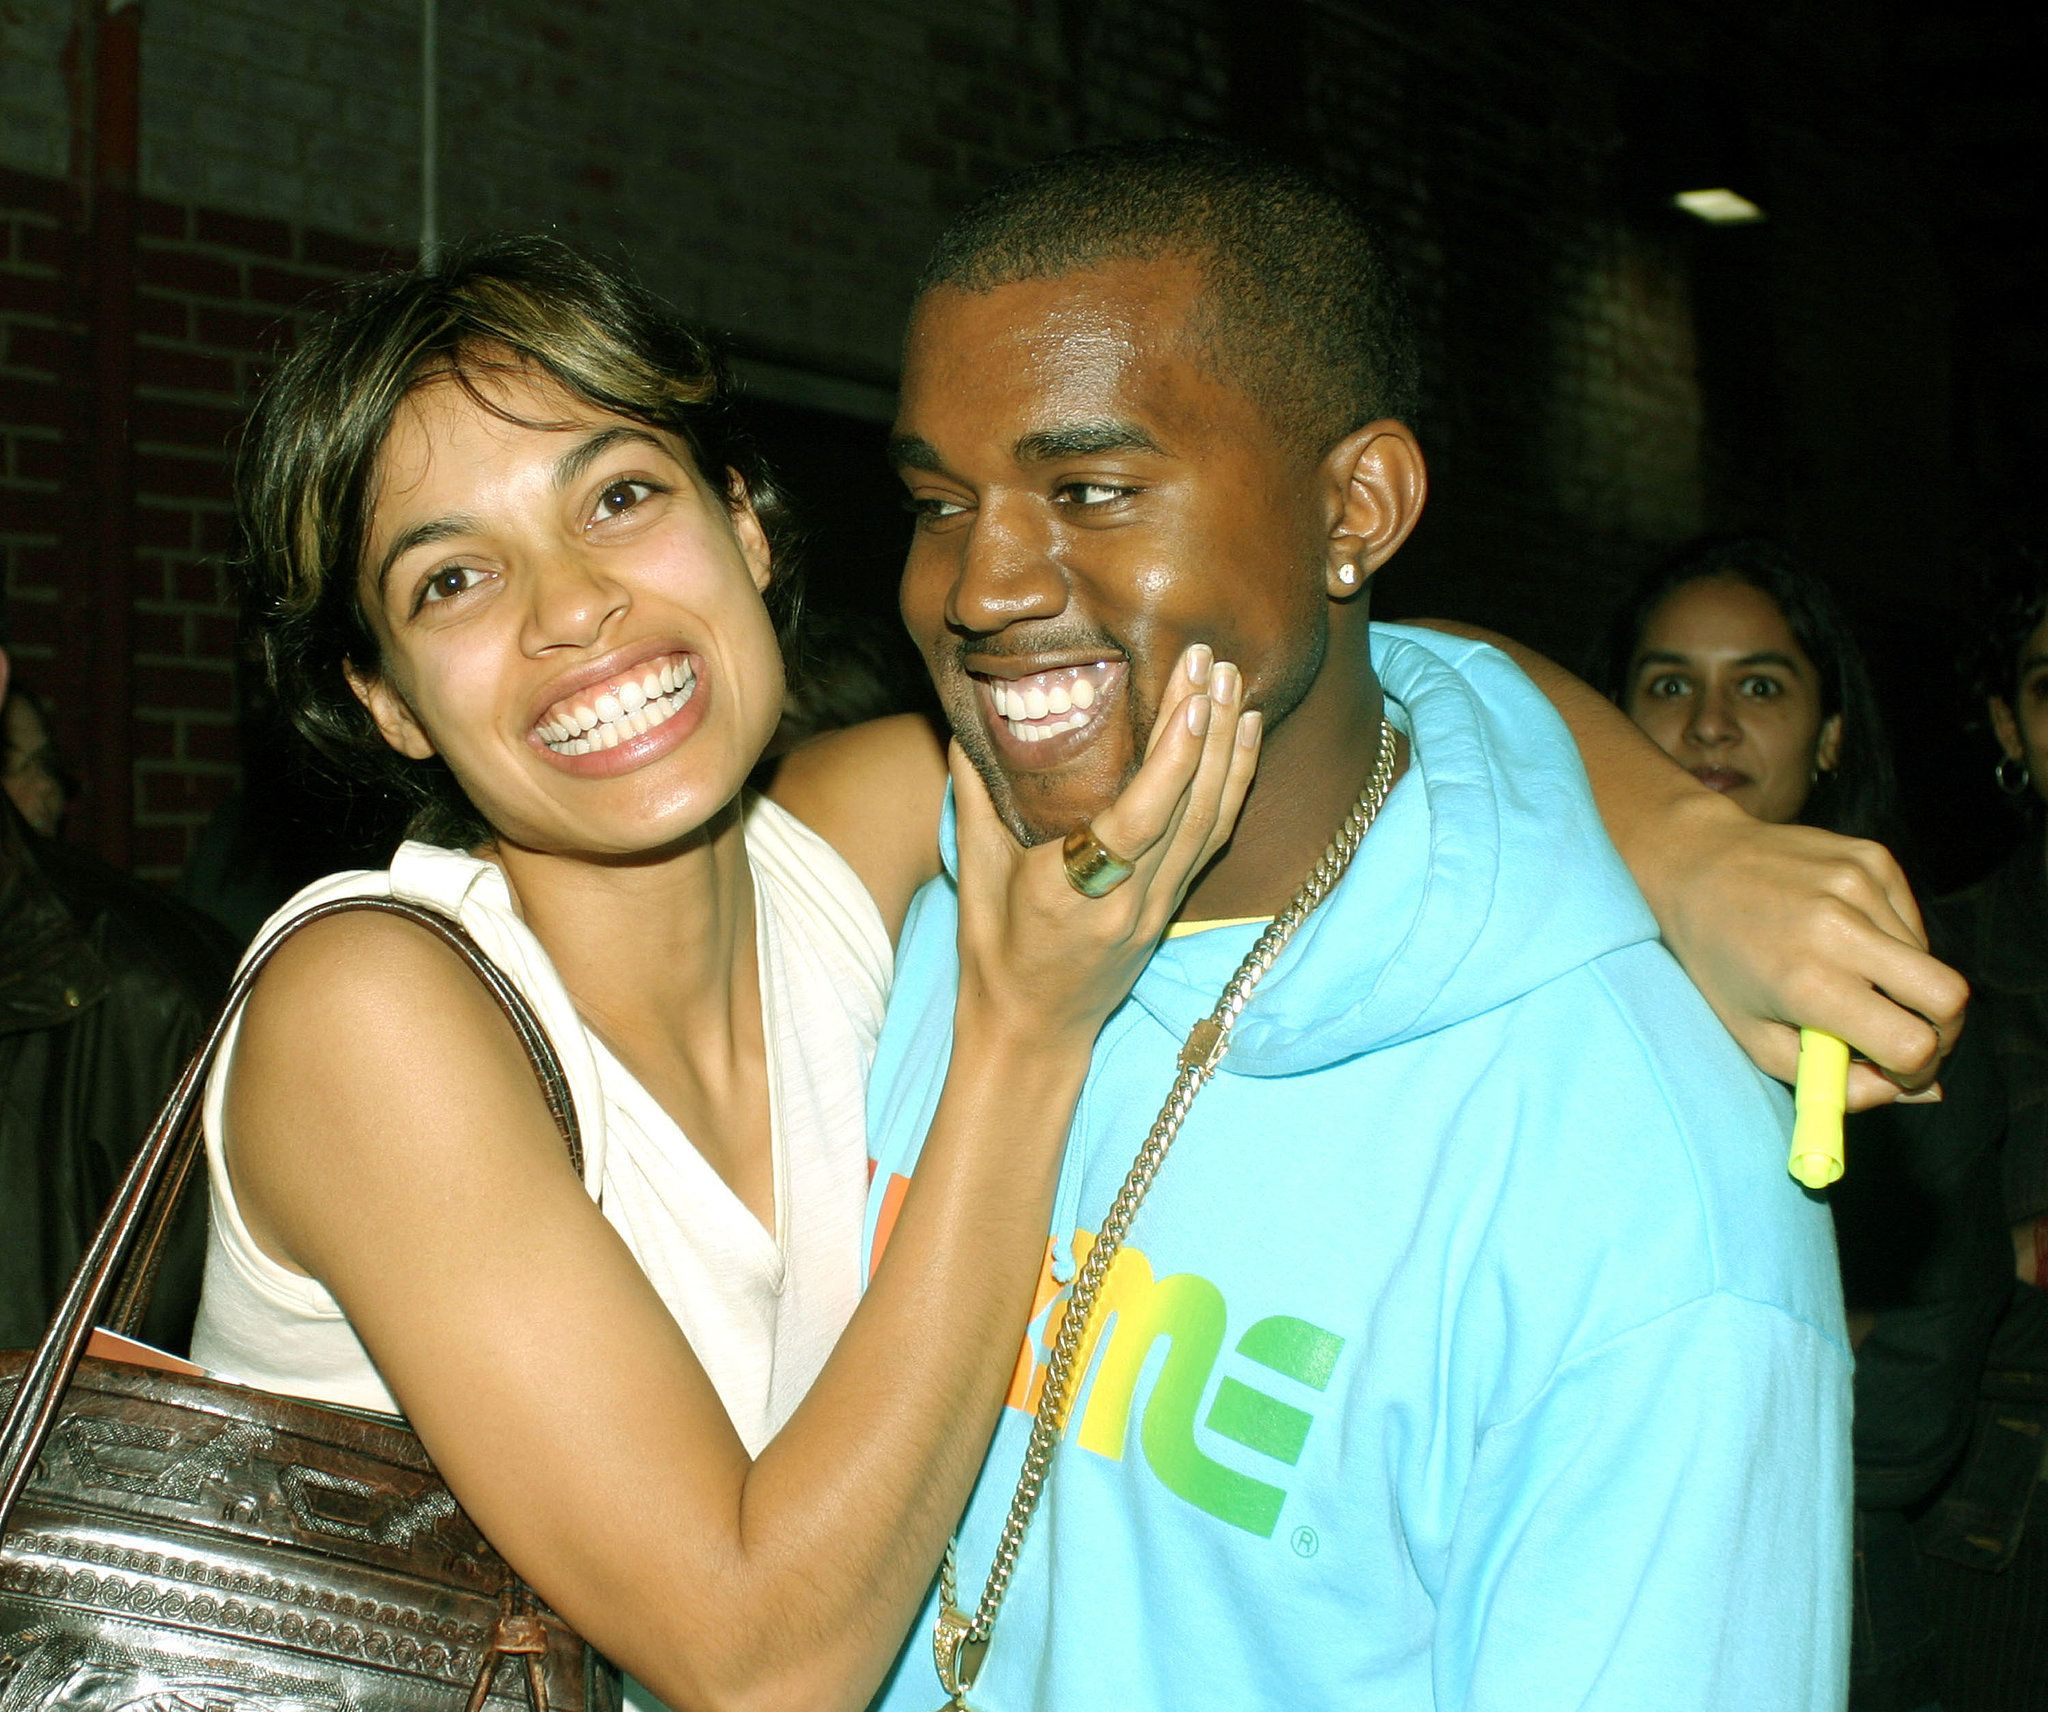 When Rosario Dawson Squeezed His Cheeks Kanye West Smiling Kanye West Kanye